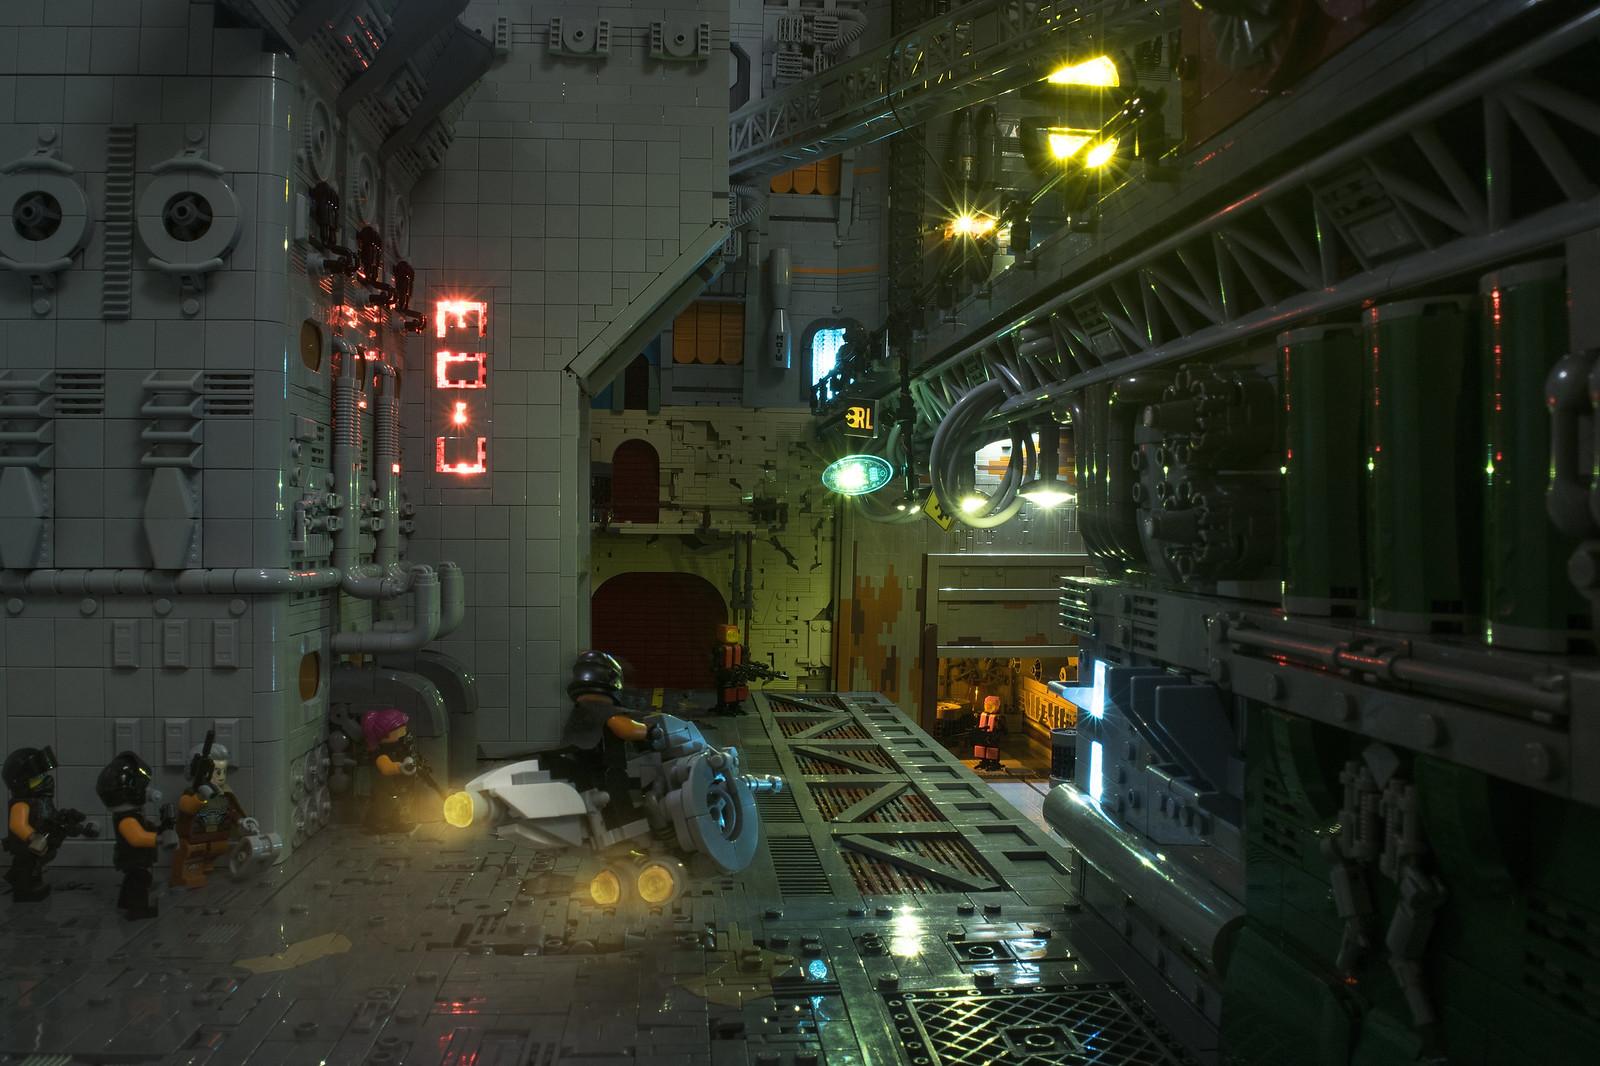 LEGO Cyberpunk Industrial Zone